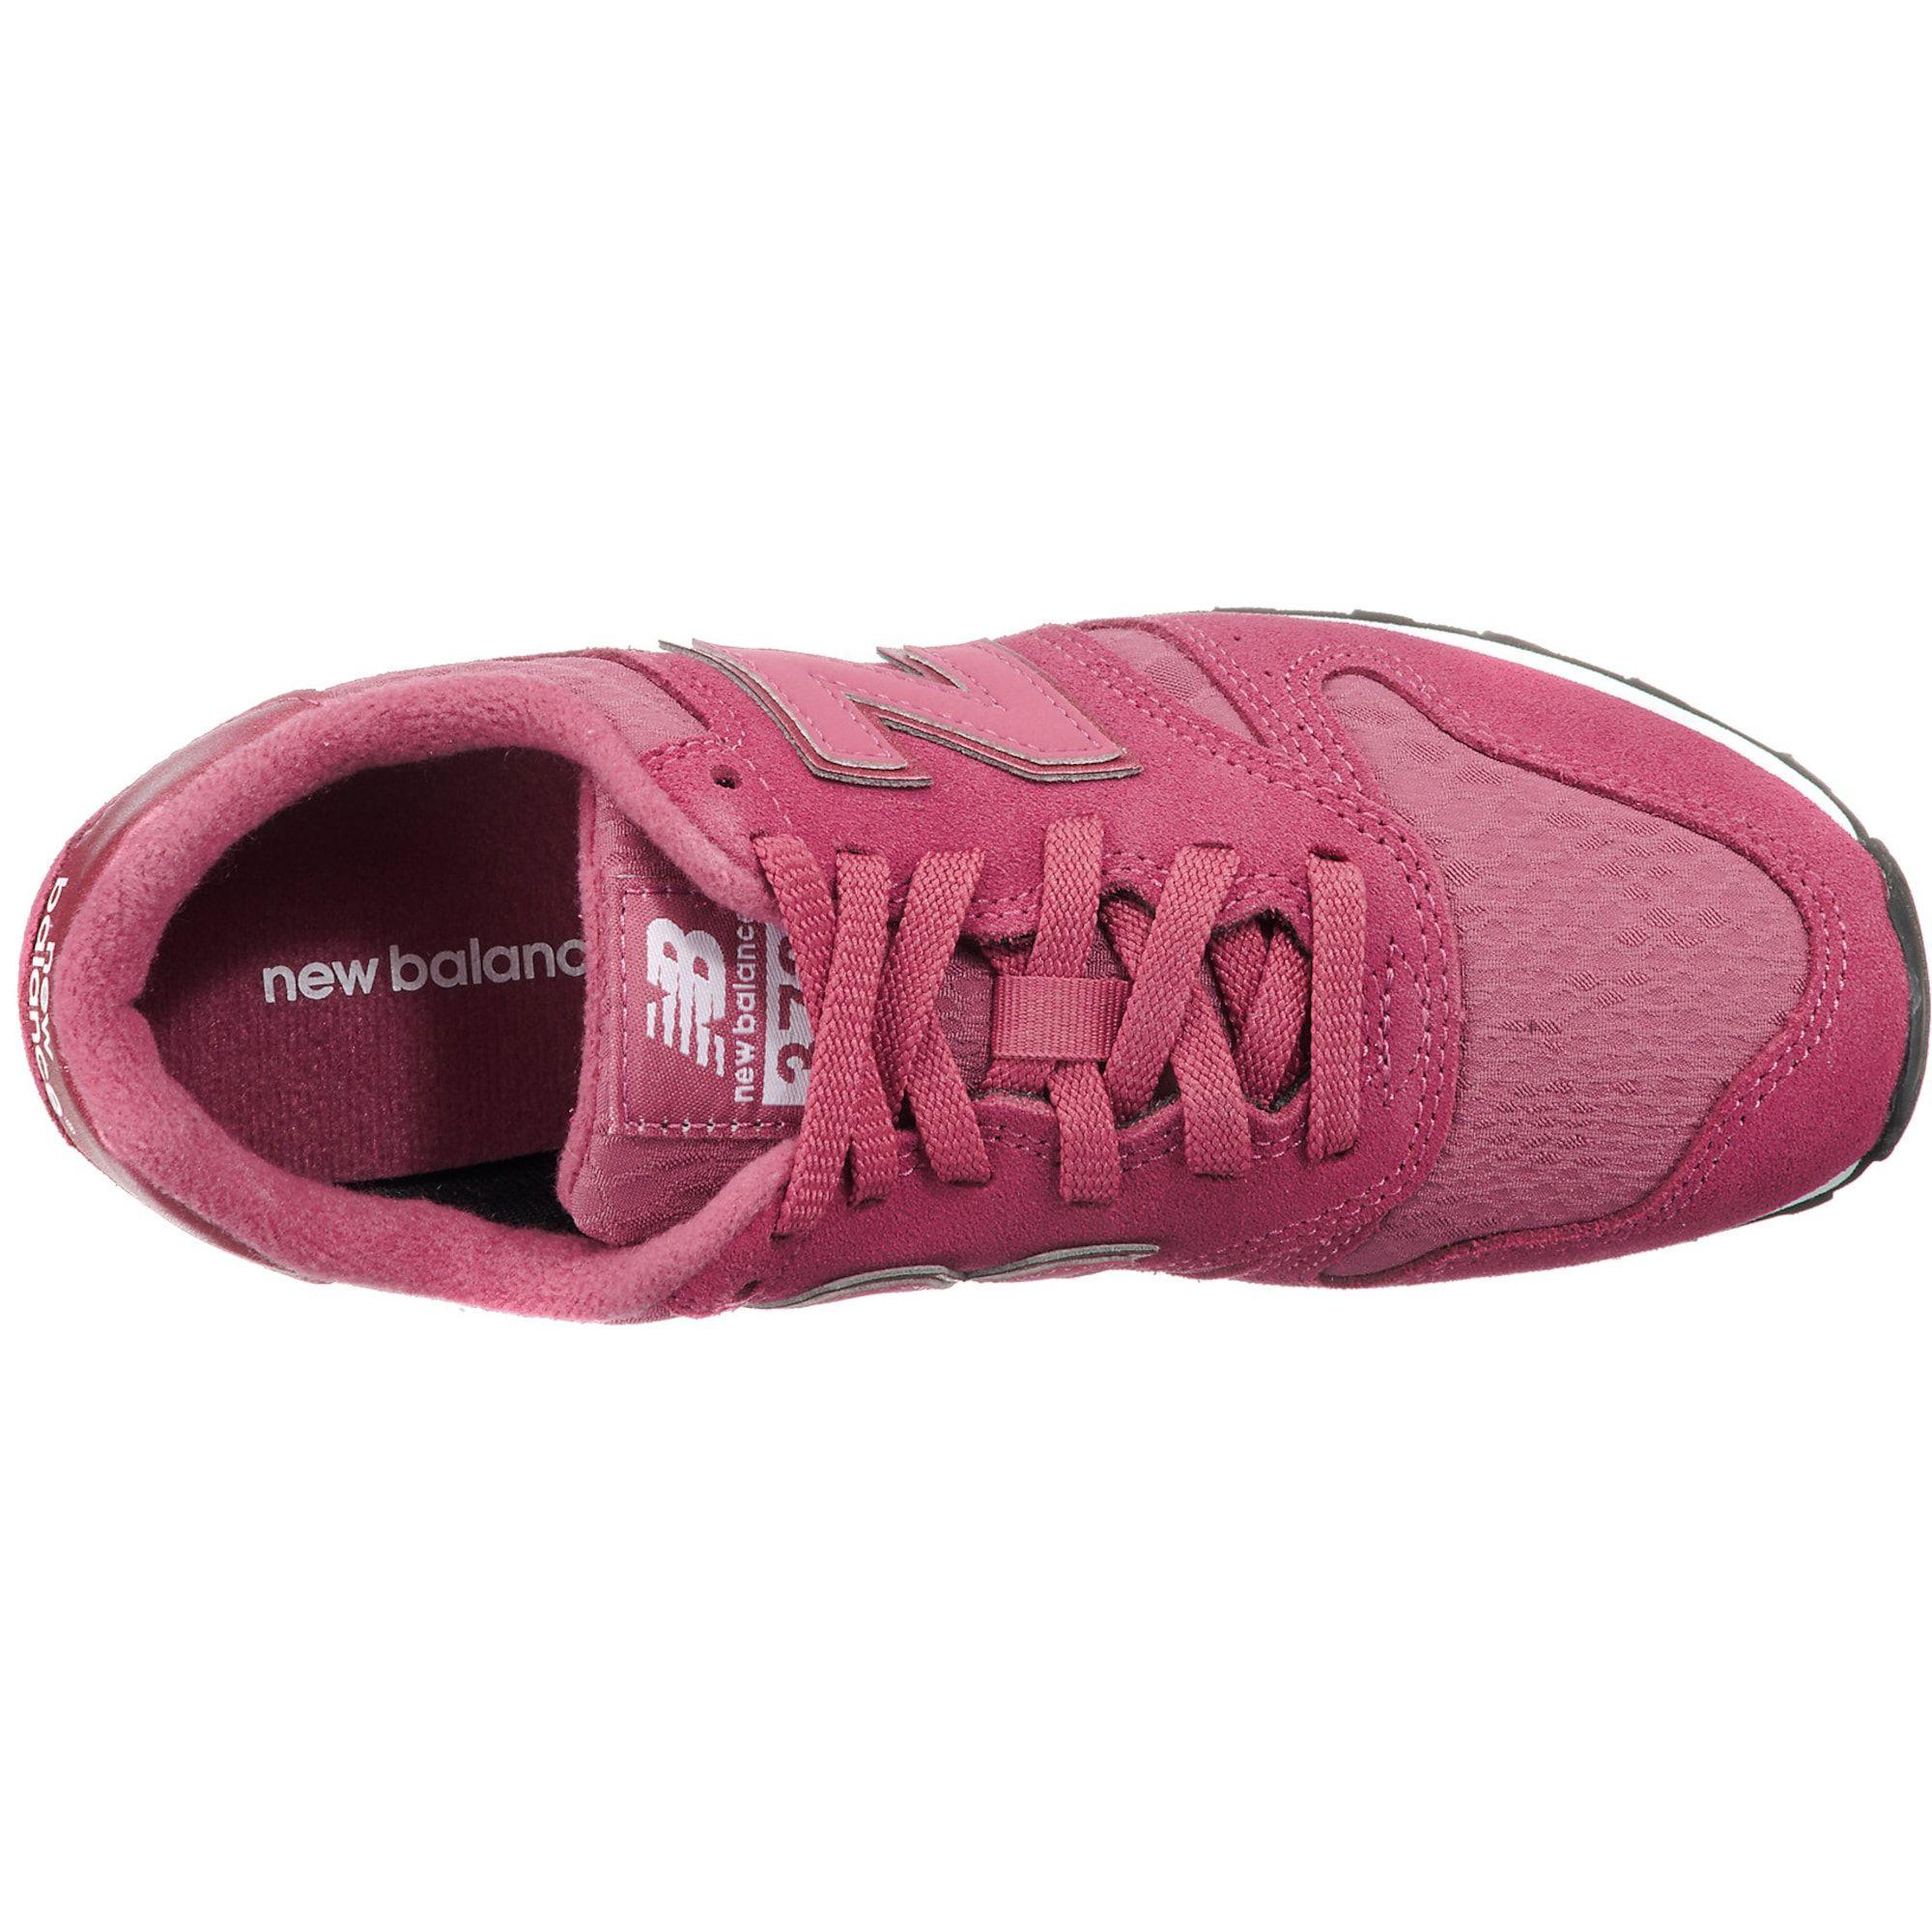 New Balance Sneaker Wl373 Damen Rosa Magenta Grosse 42 5 New Balance Magenta Und Damen